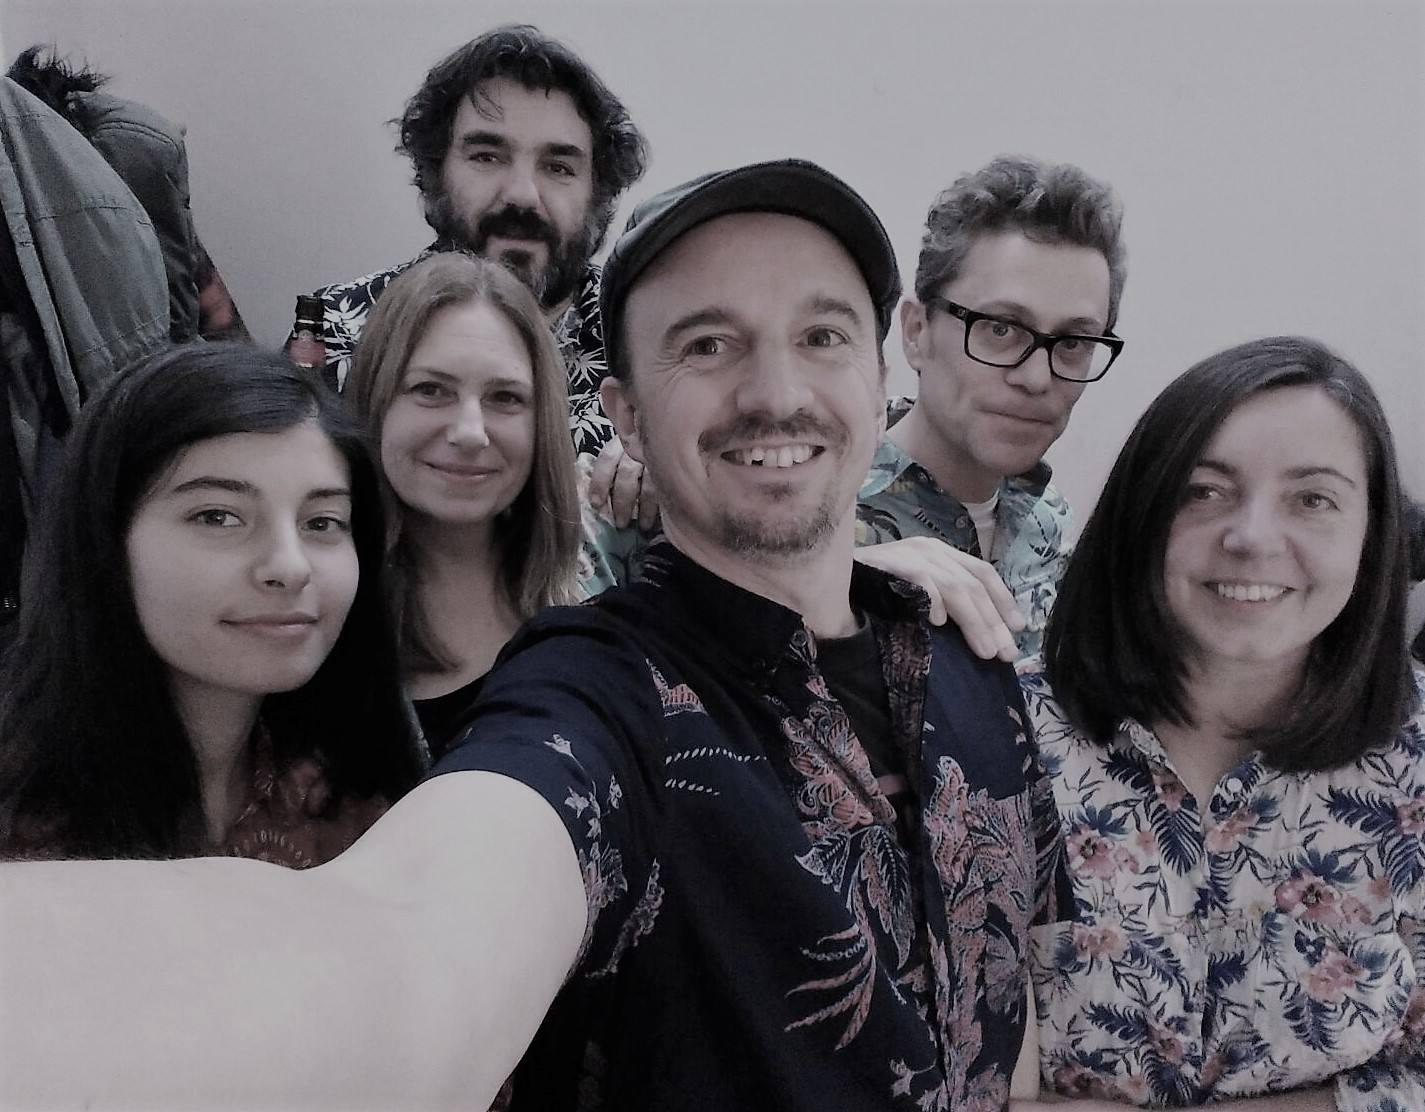 Ukestra do Medio, concierto en Pontevedra